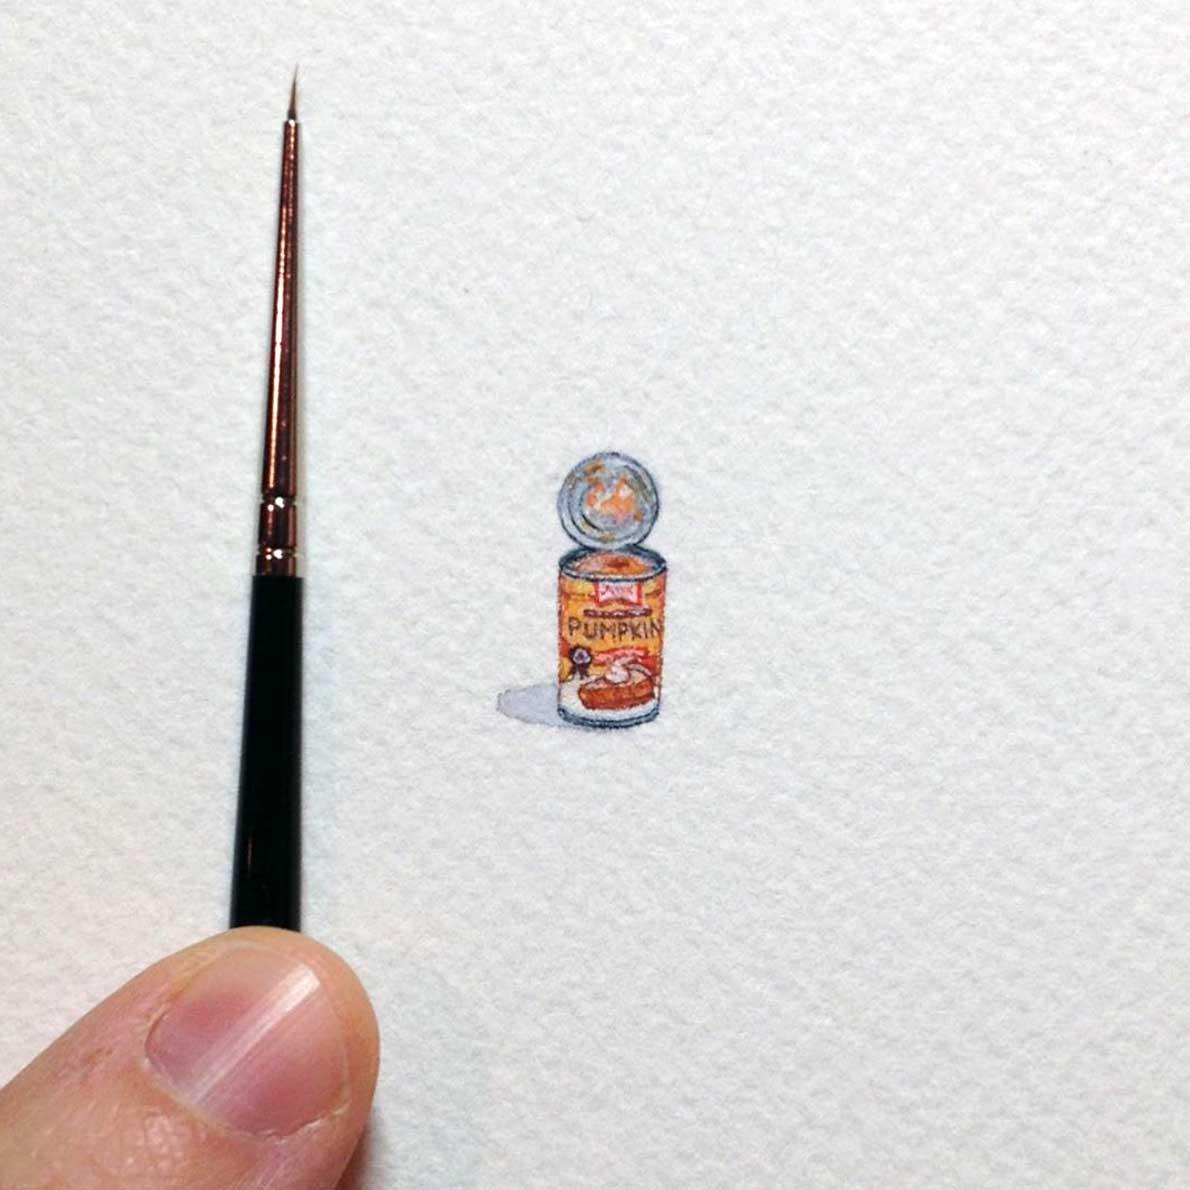 Miniatur-Gemälde von Brooke Rothshank Brooke-Rothshank-miniatur-malerei_05